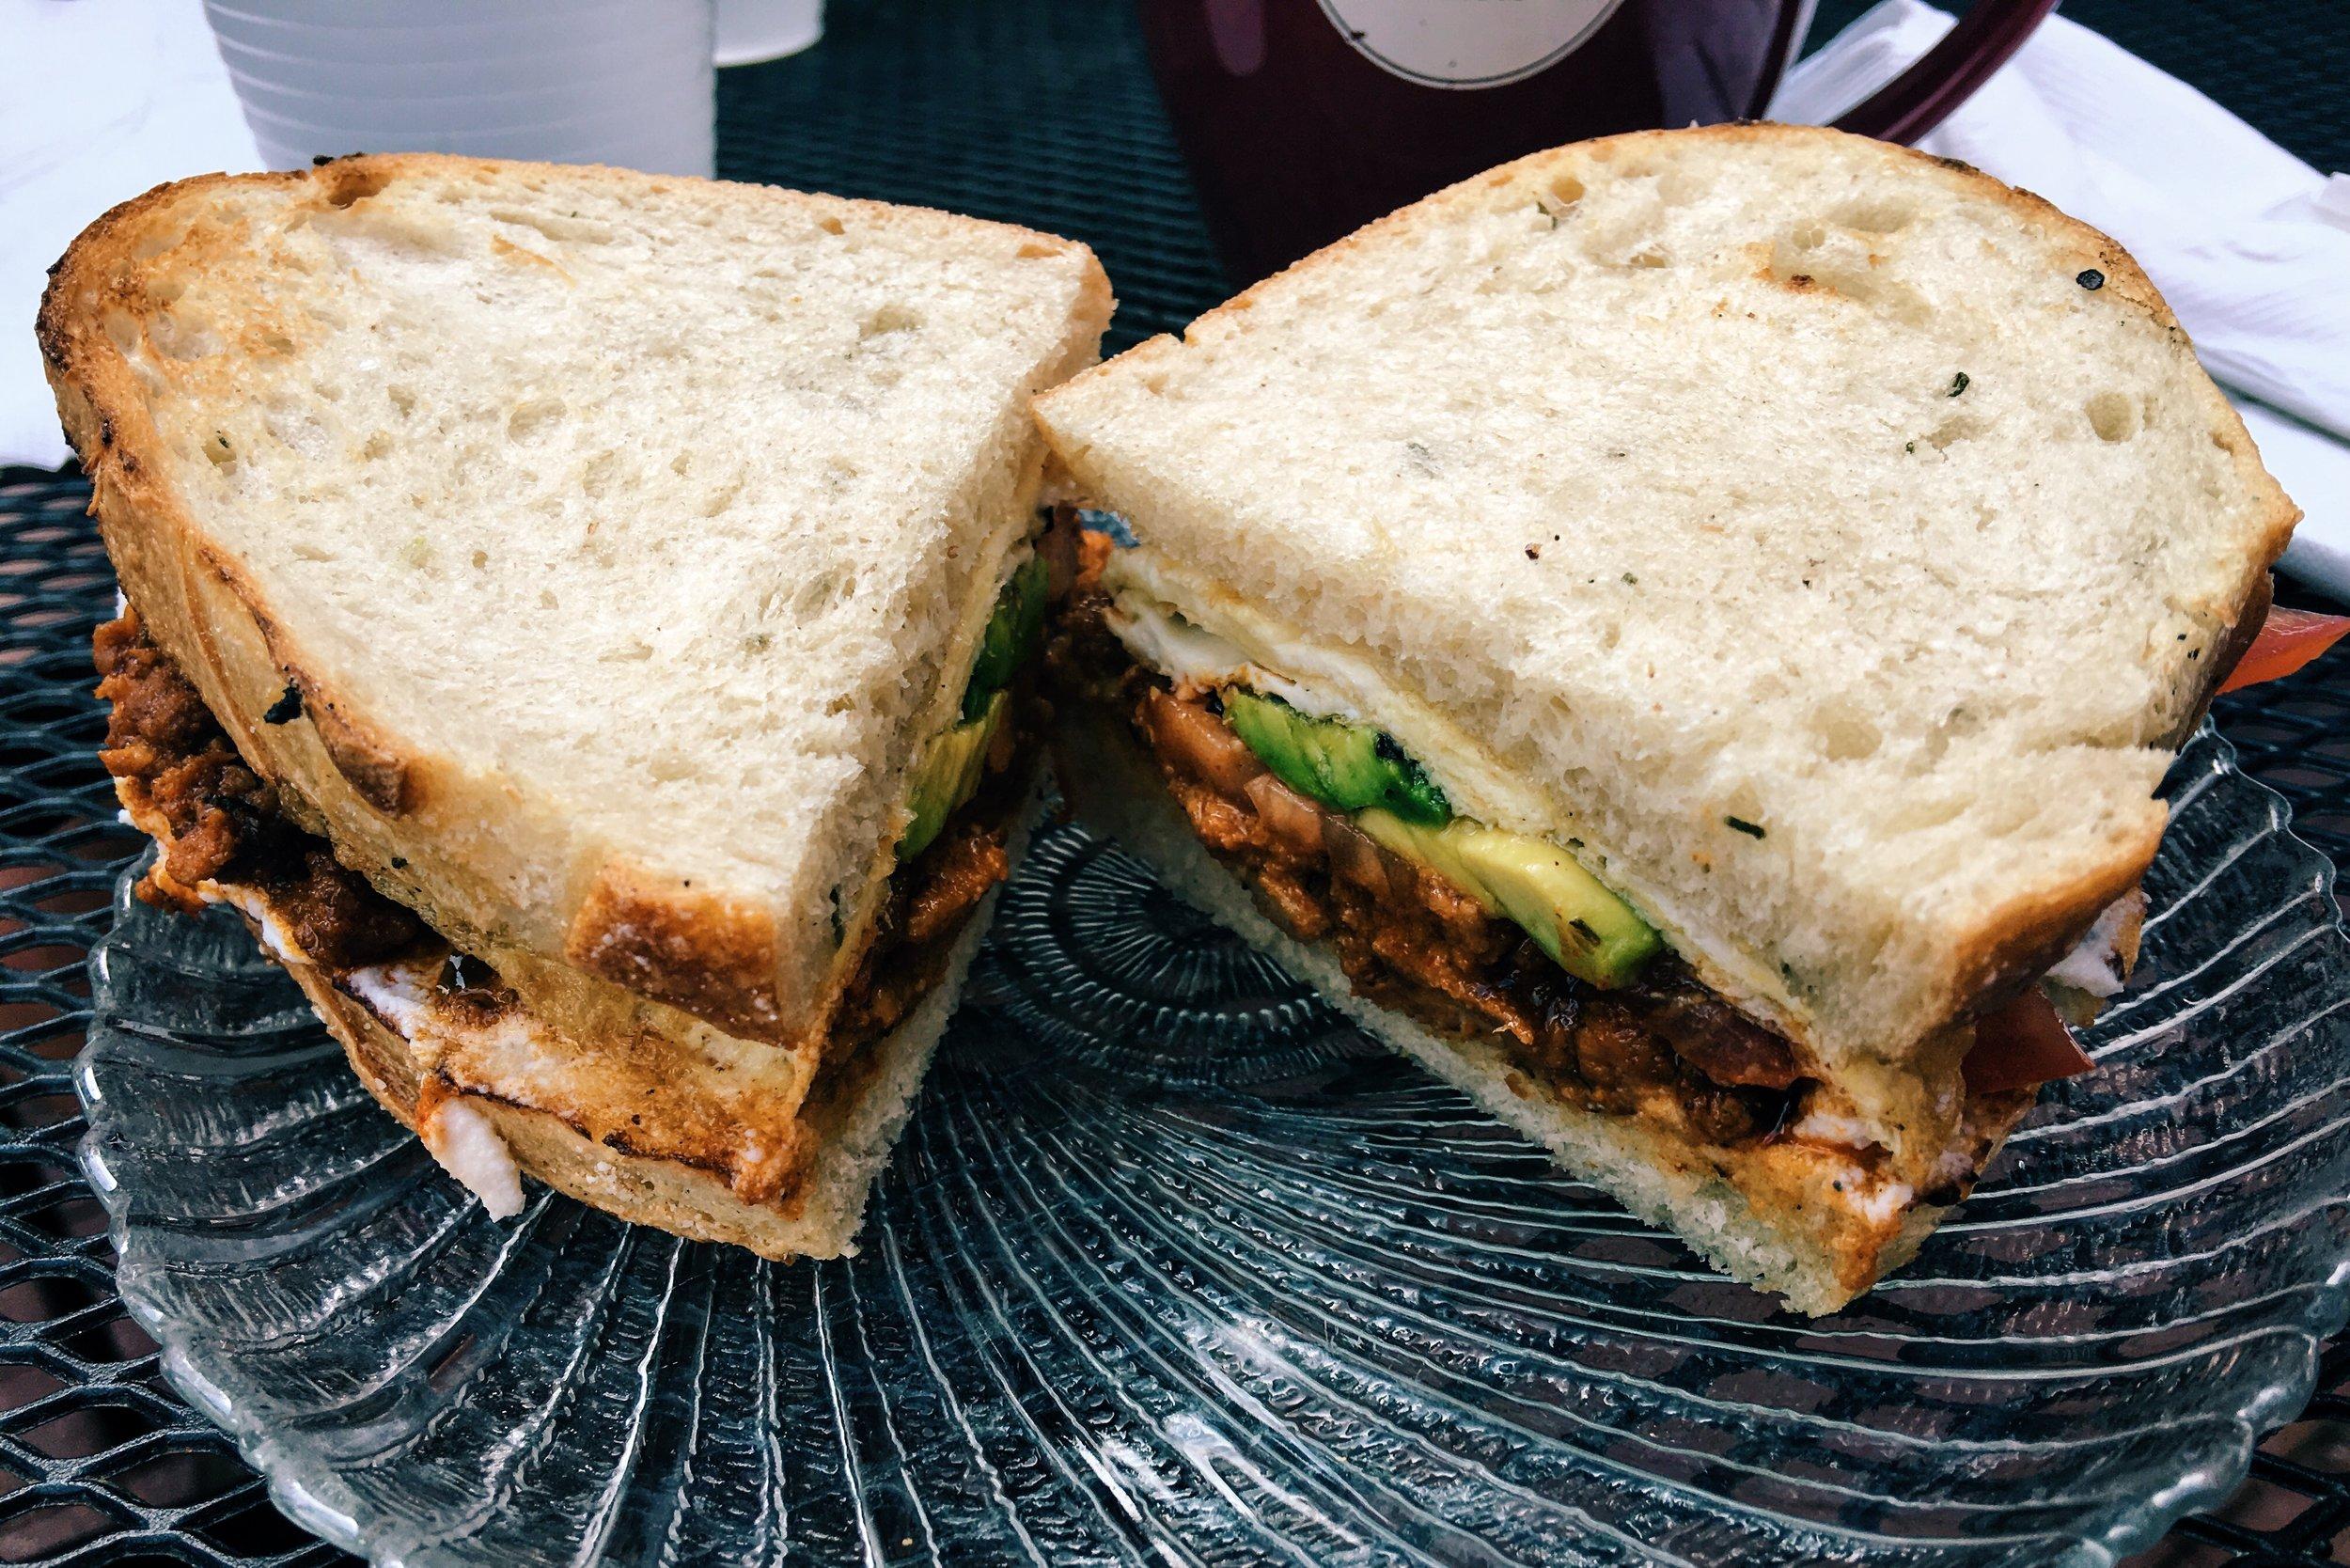 Breakfast sandwich at Bodega Ultima in Augusta GA